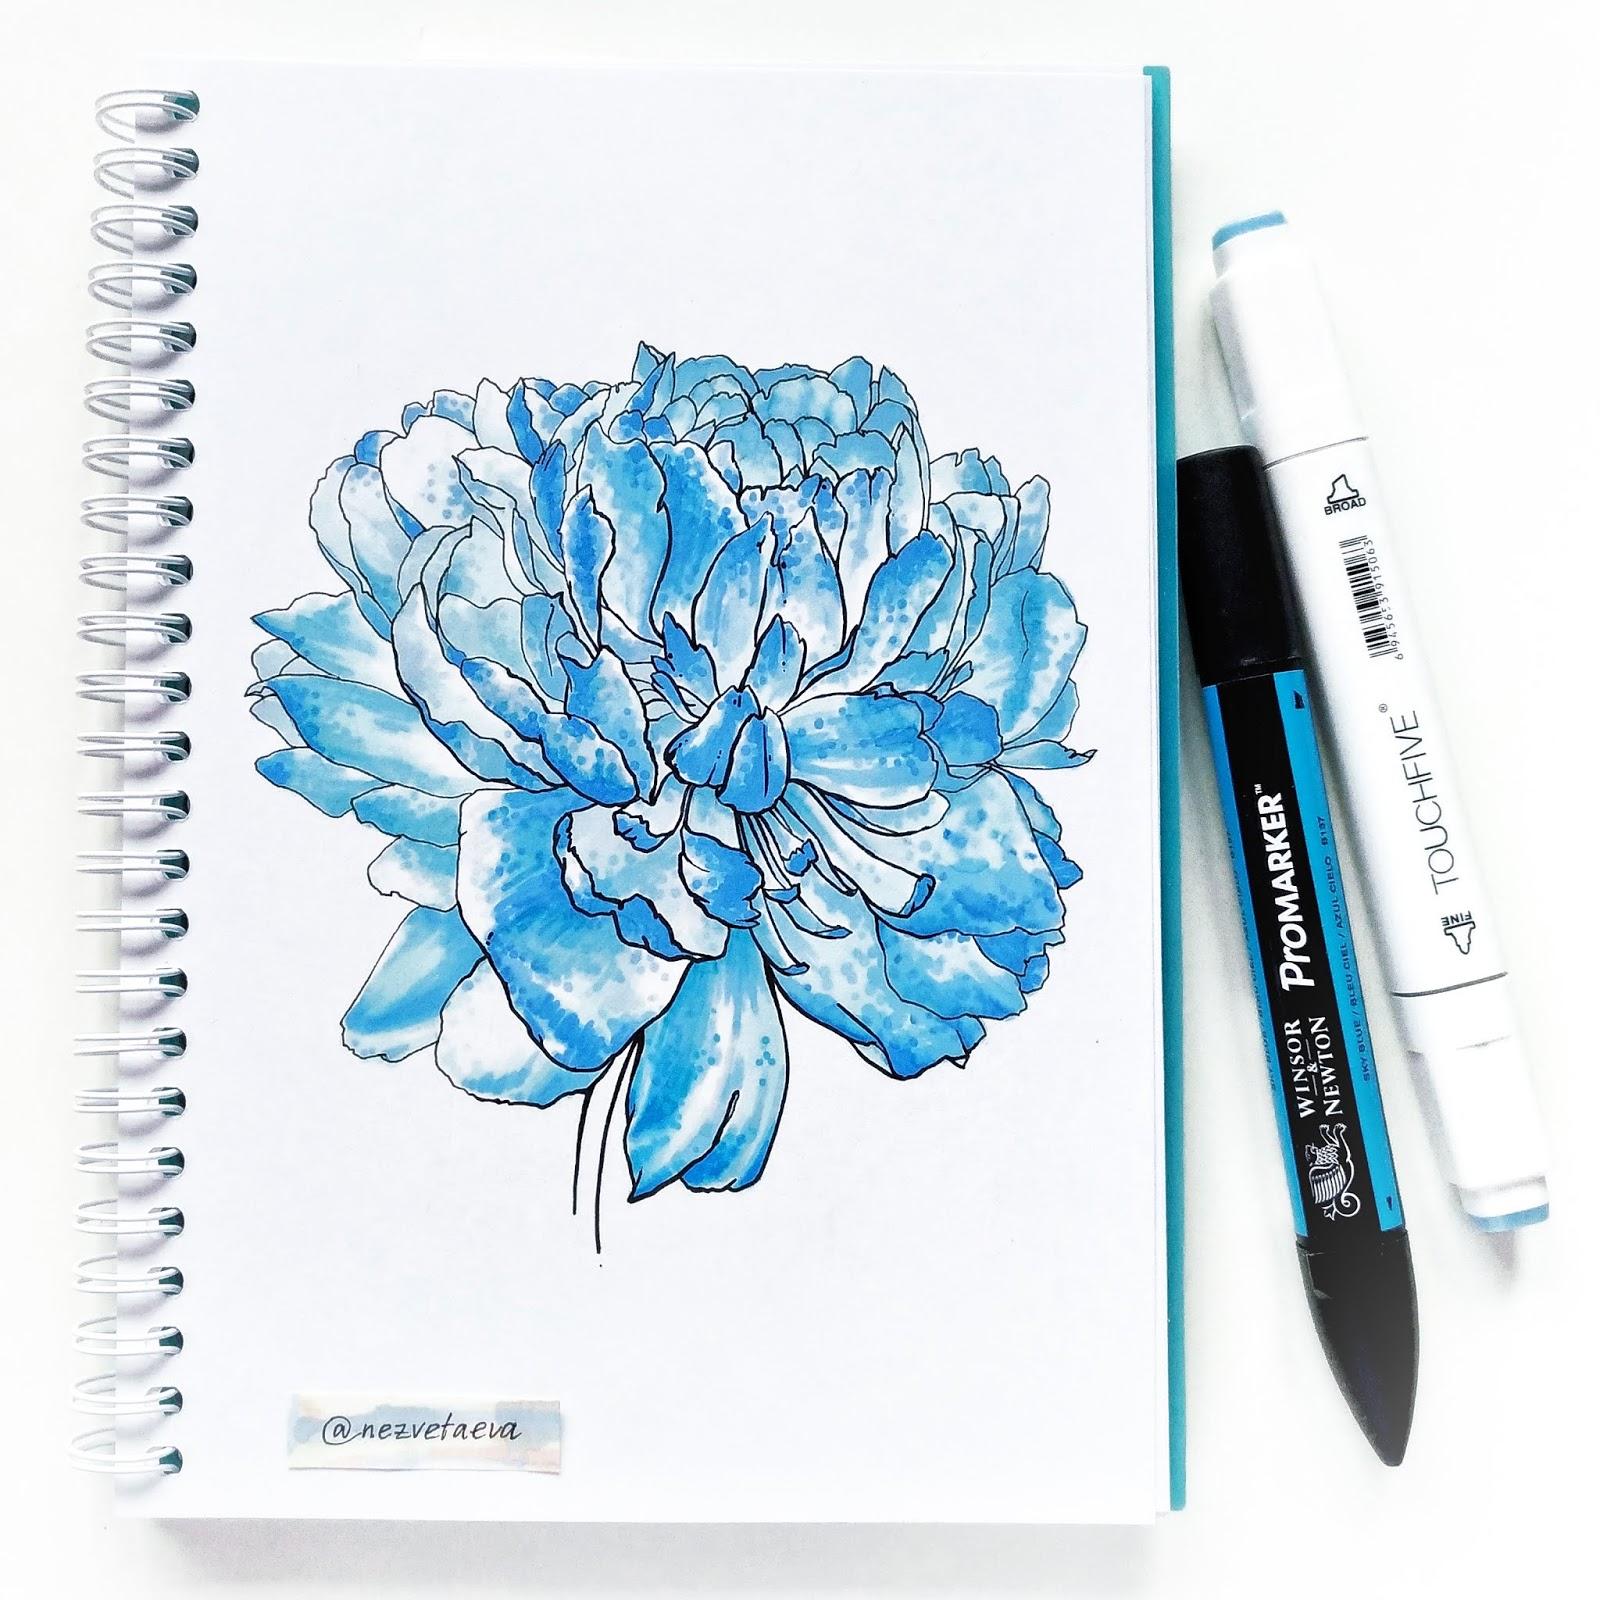 Blue peony sketch by Sonia Nezvetaeva